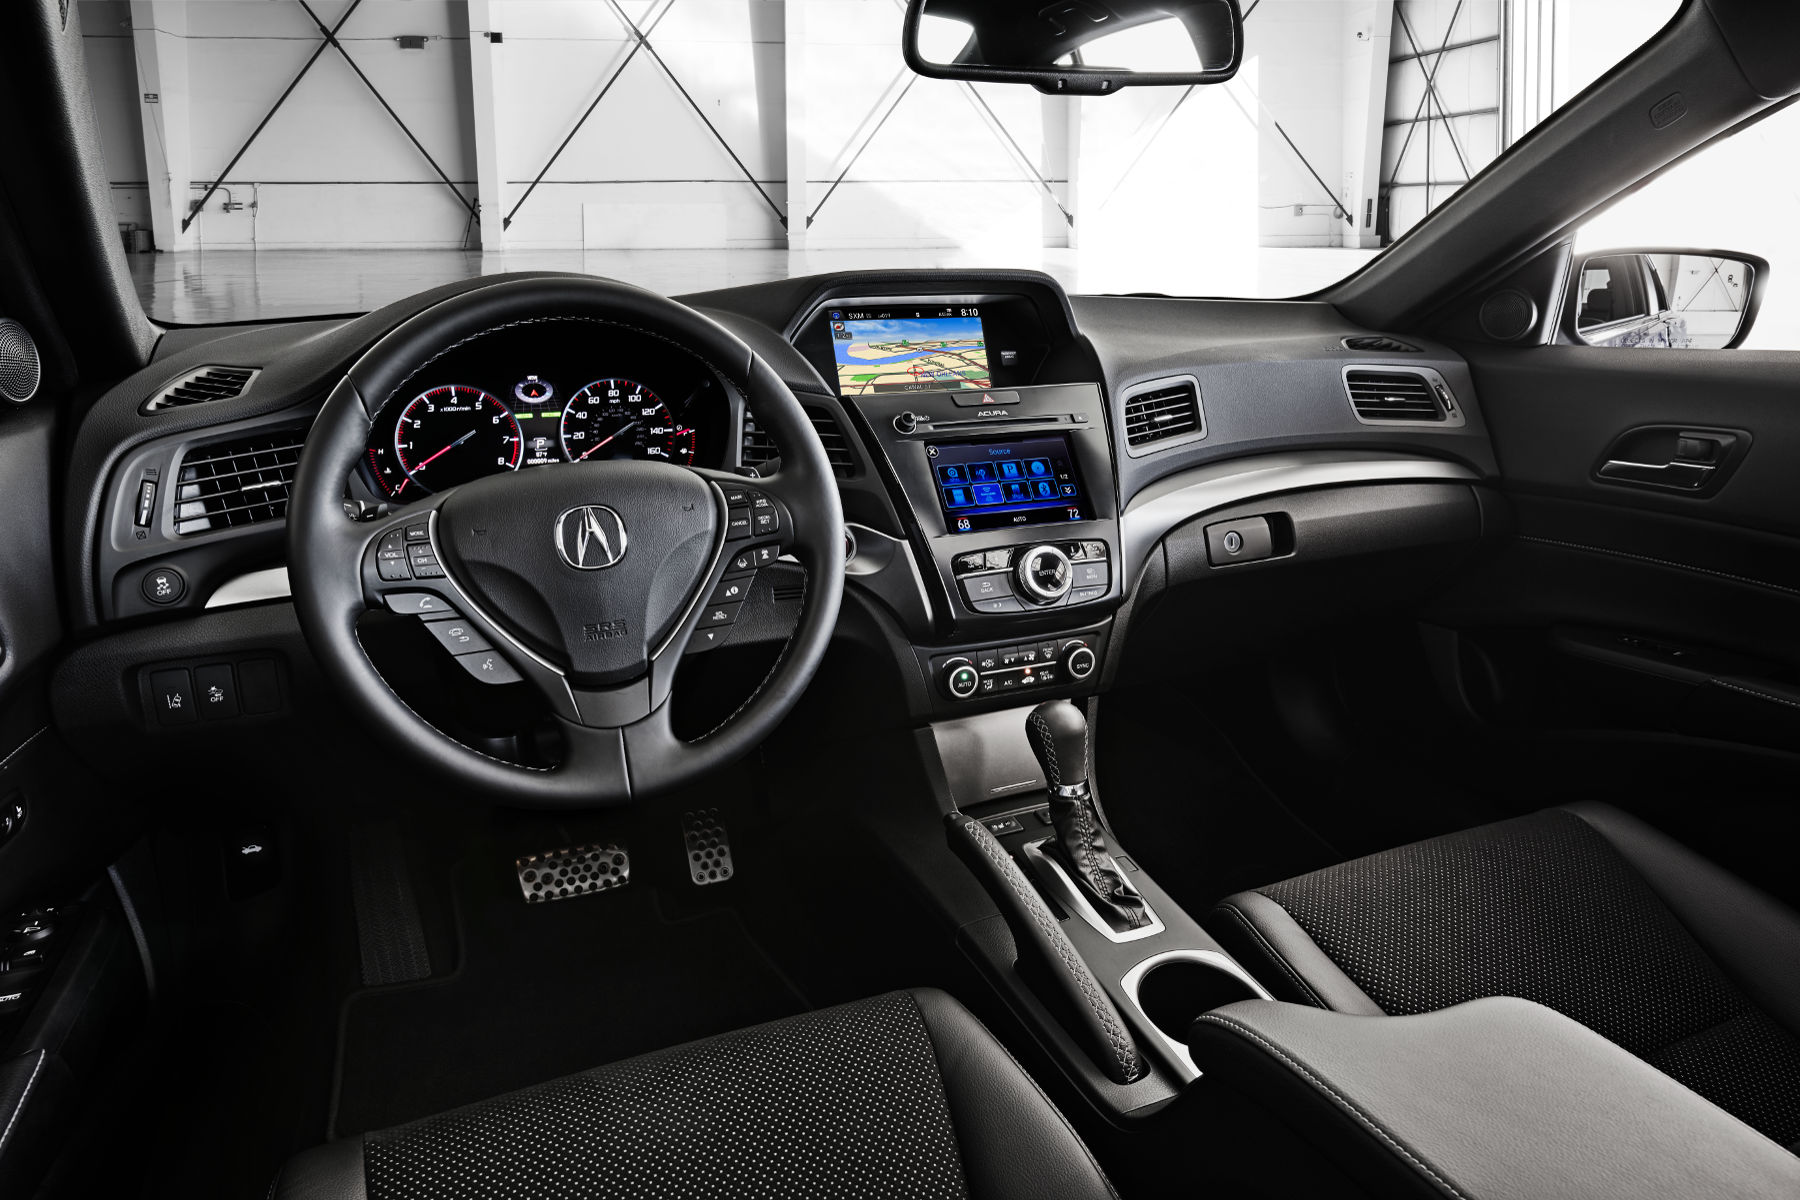 2016 ILX interior